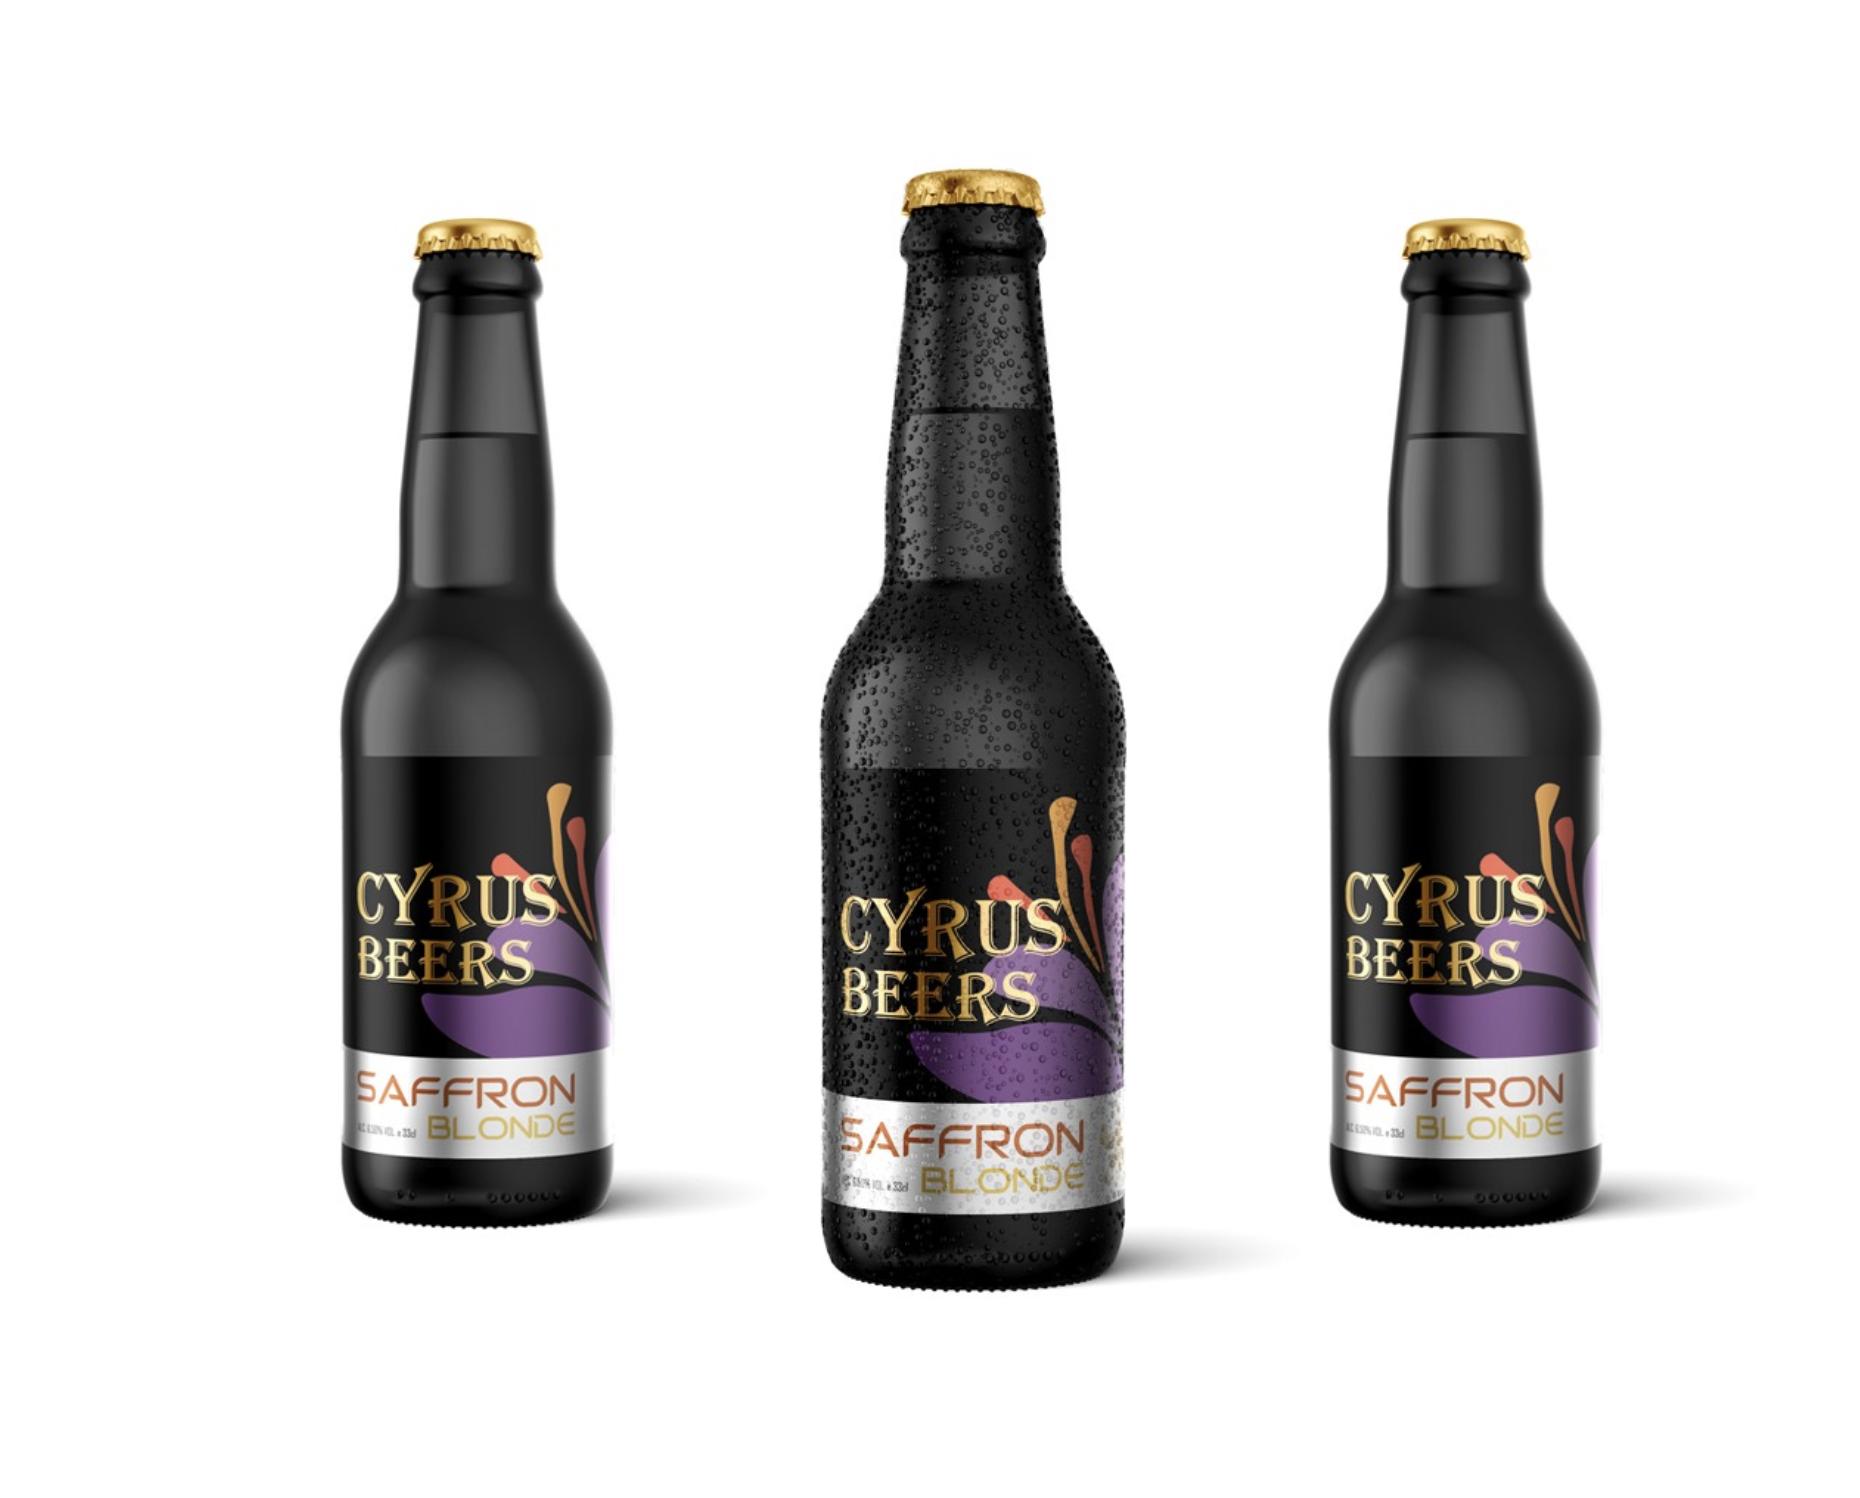 Cyrus Beers - Saffron Blonde -Belgian Style Beer & Persian Saffron